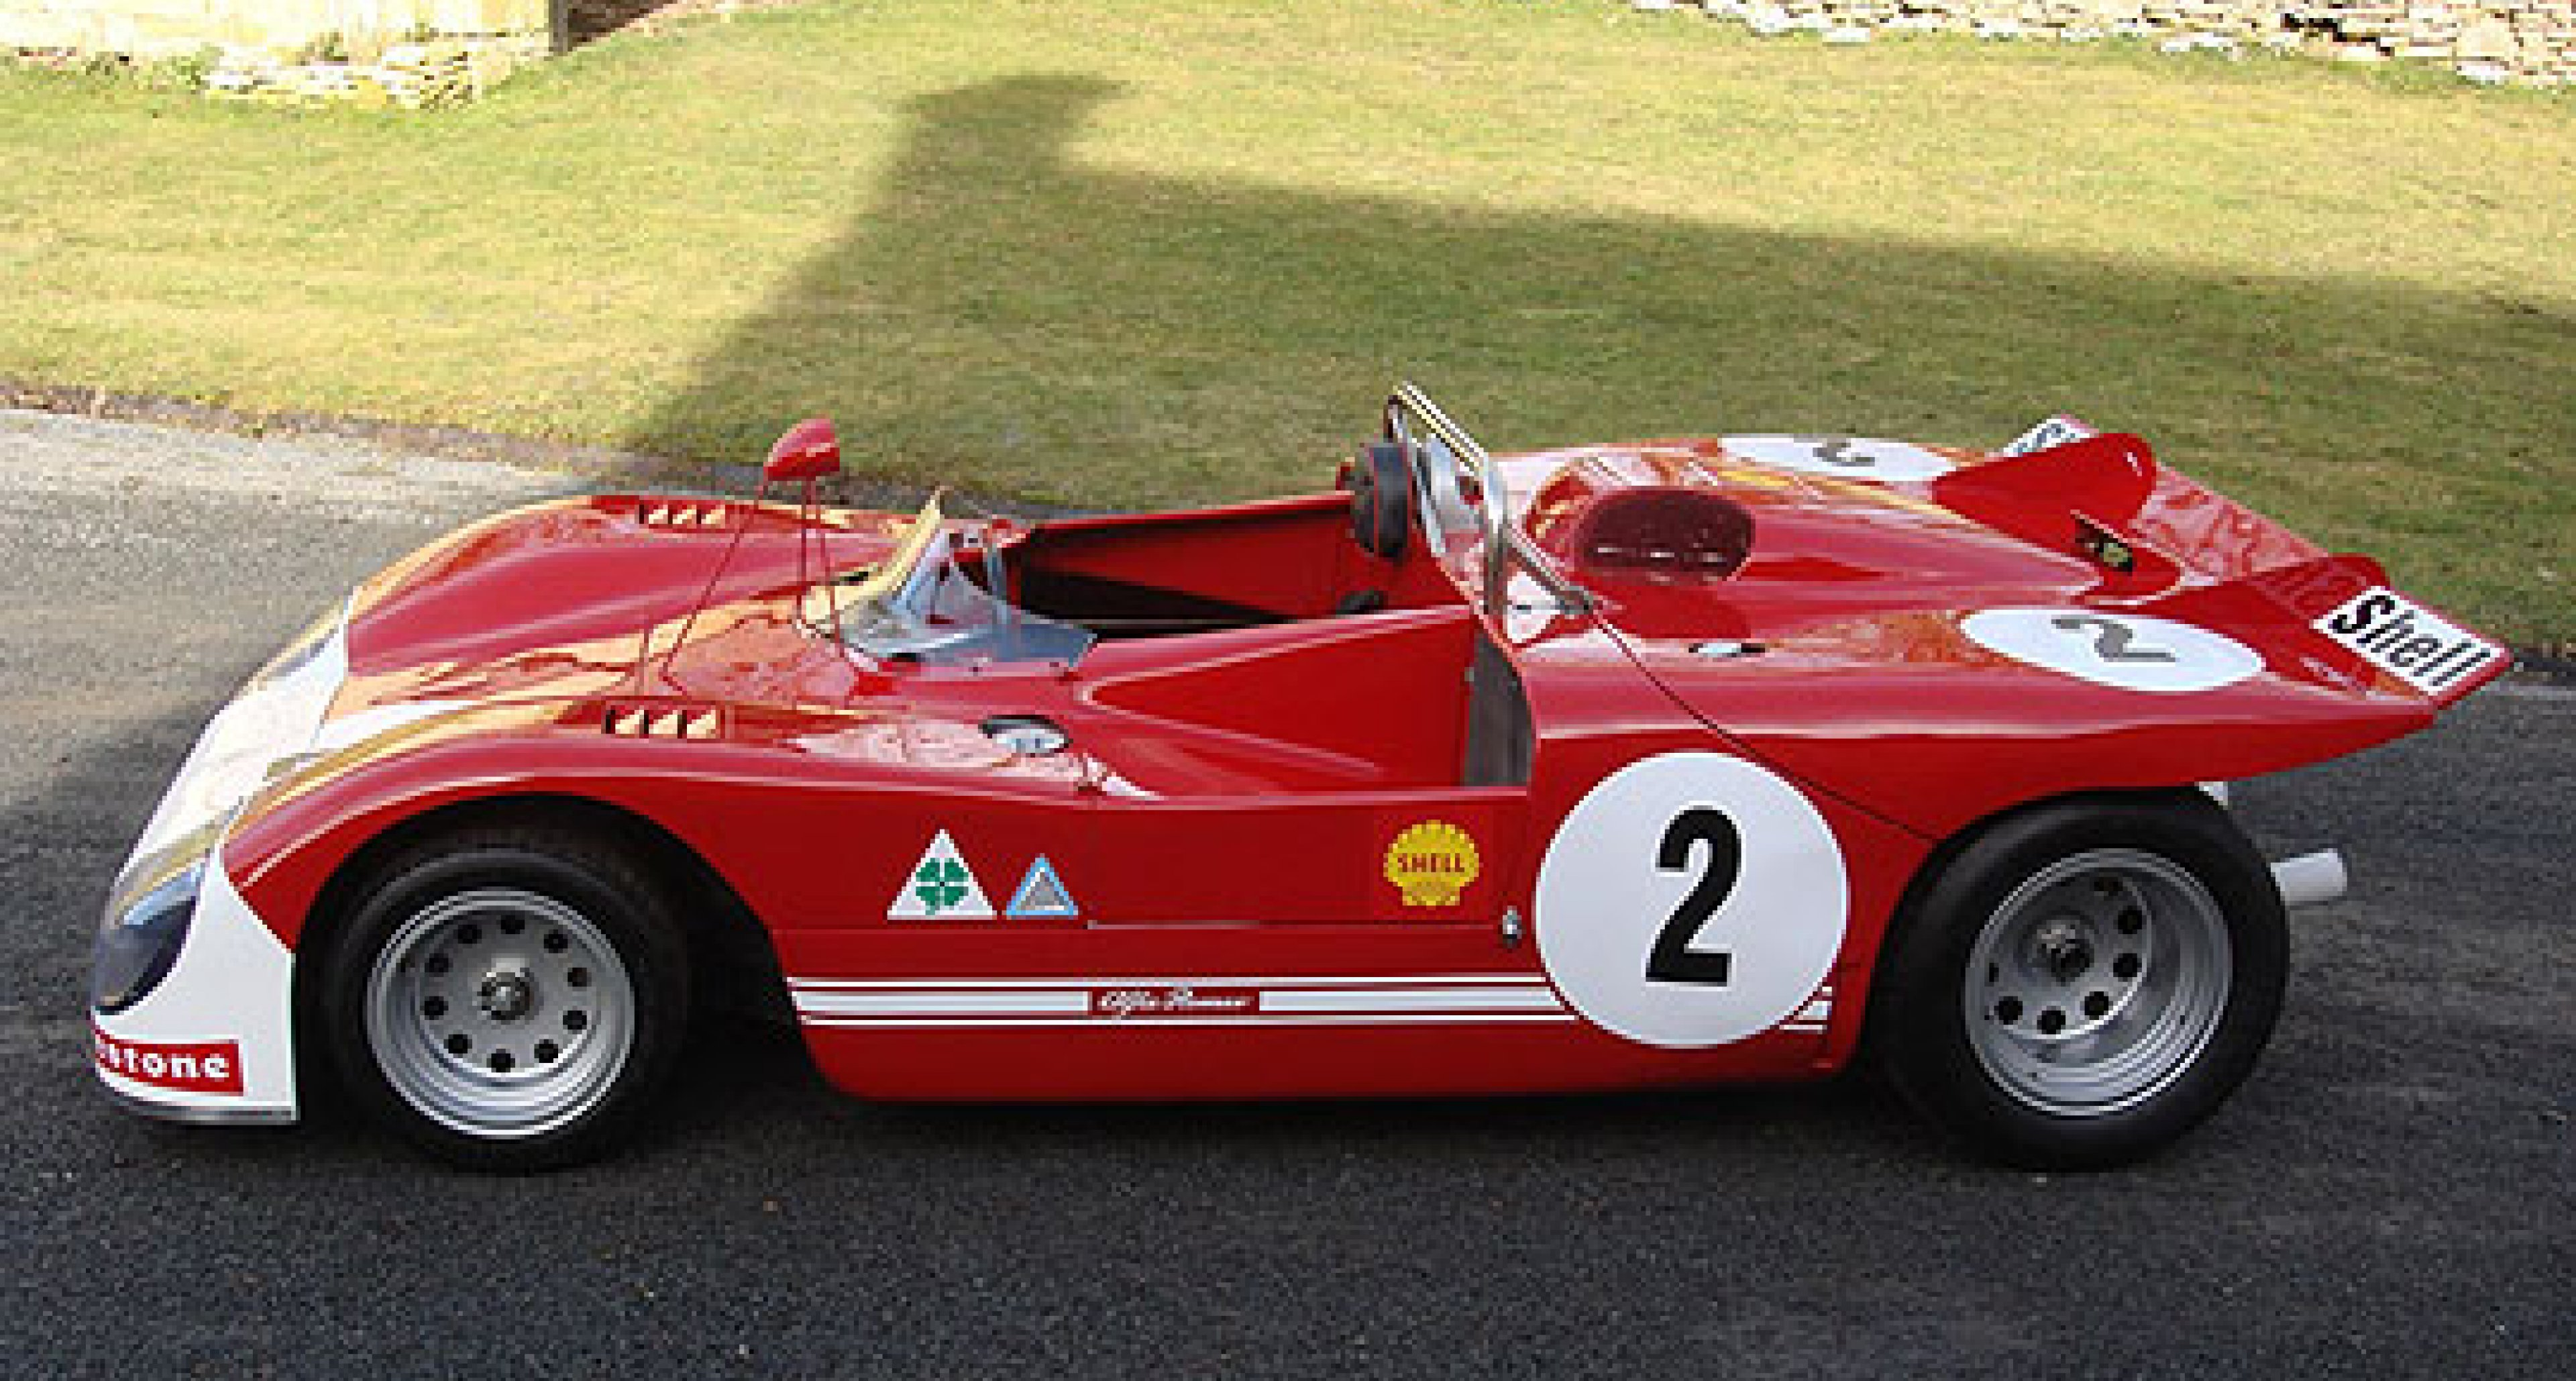 This 1974 Jaguar E-type Series 3 V12 6.1 restomod is just